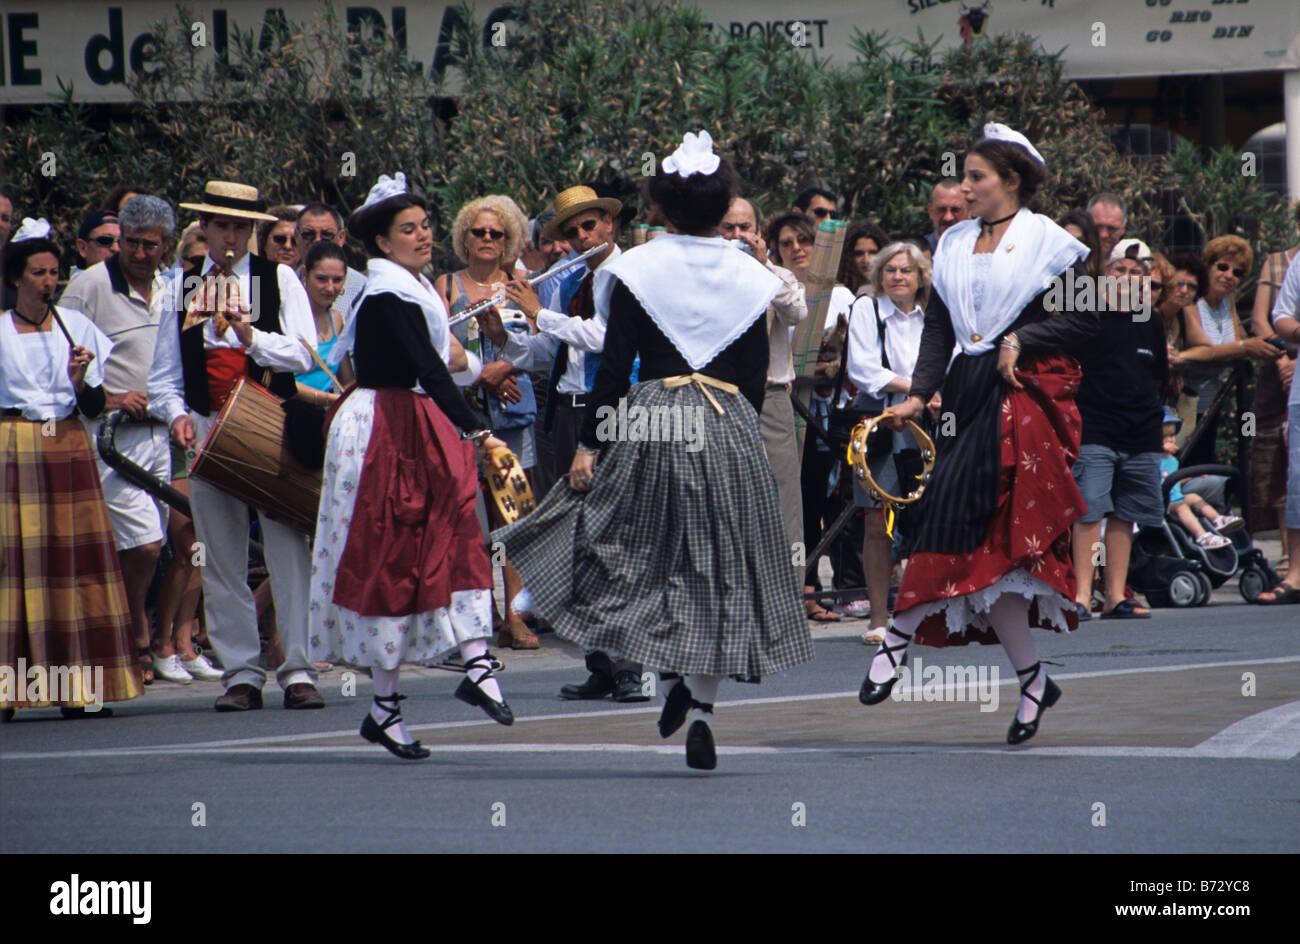 Traditional Provencal Dancers and Musicians, Saintes-Maries-de-la-Mer, Camargue, France - Stock Image